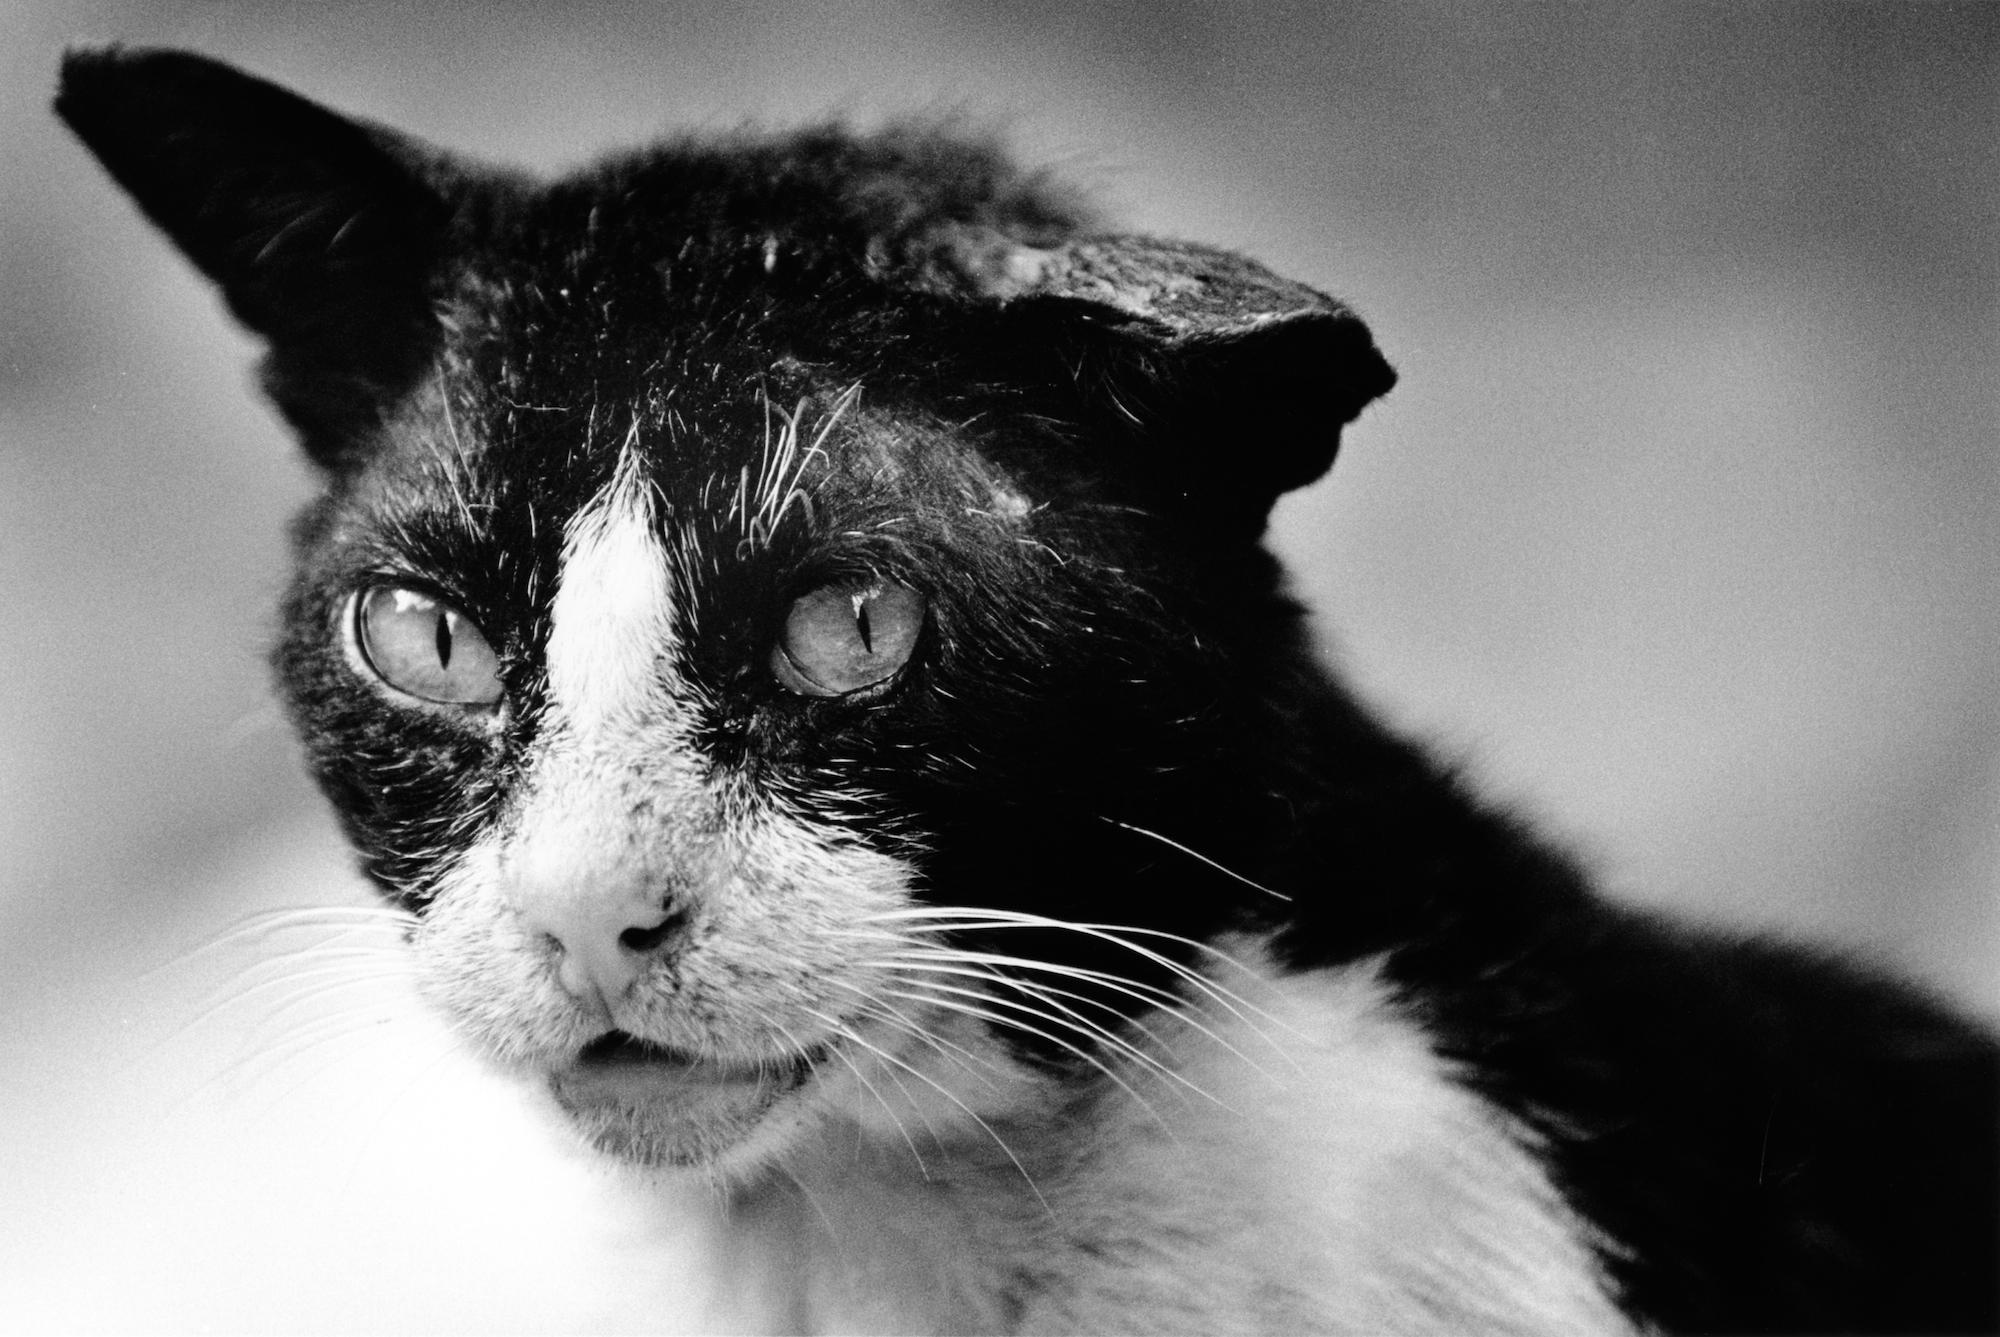 walter_rothwell_photography_cats-014.jpg